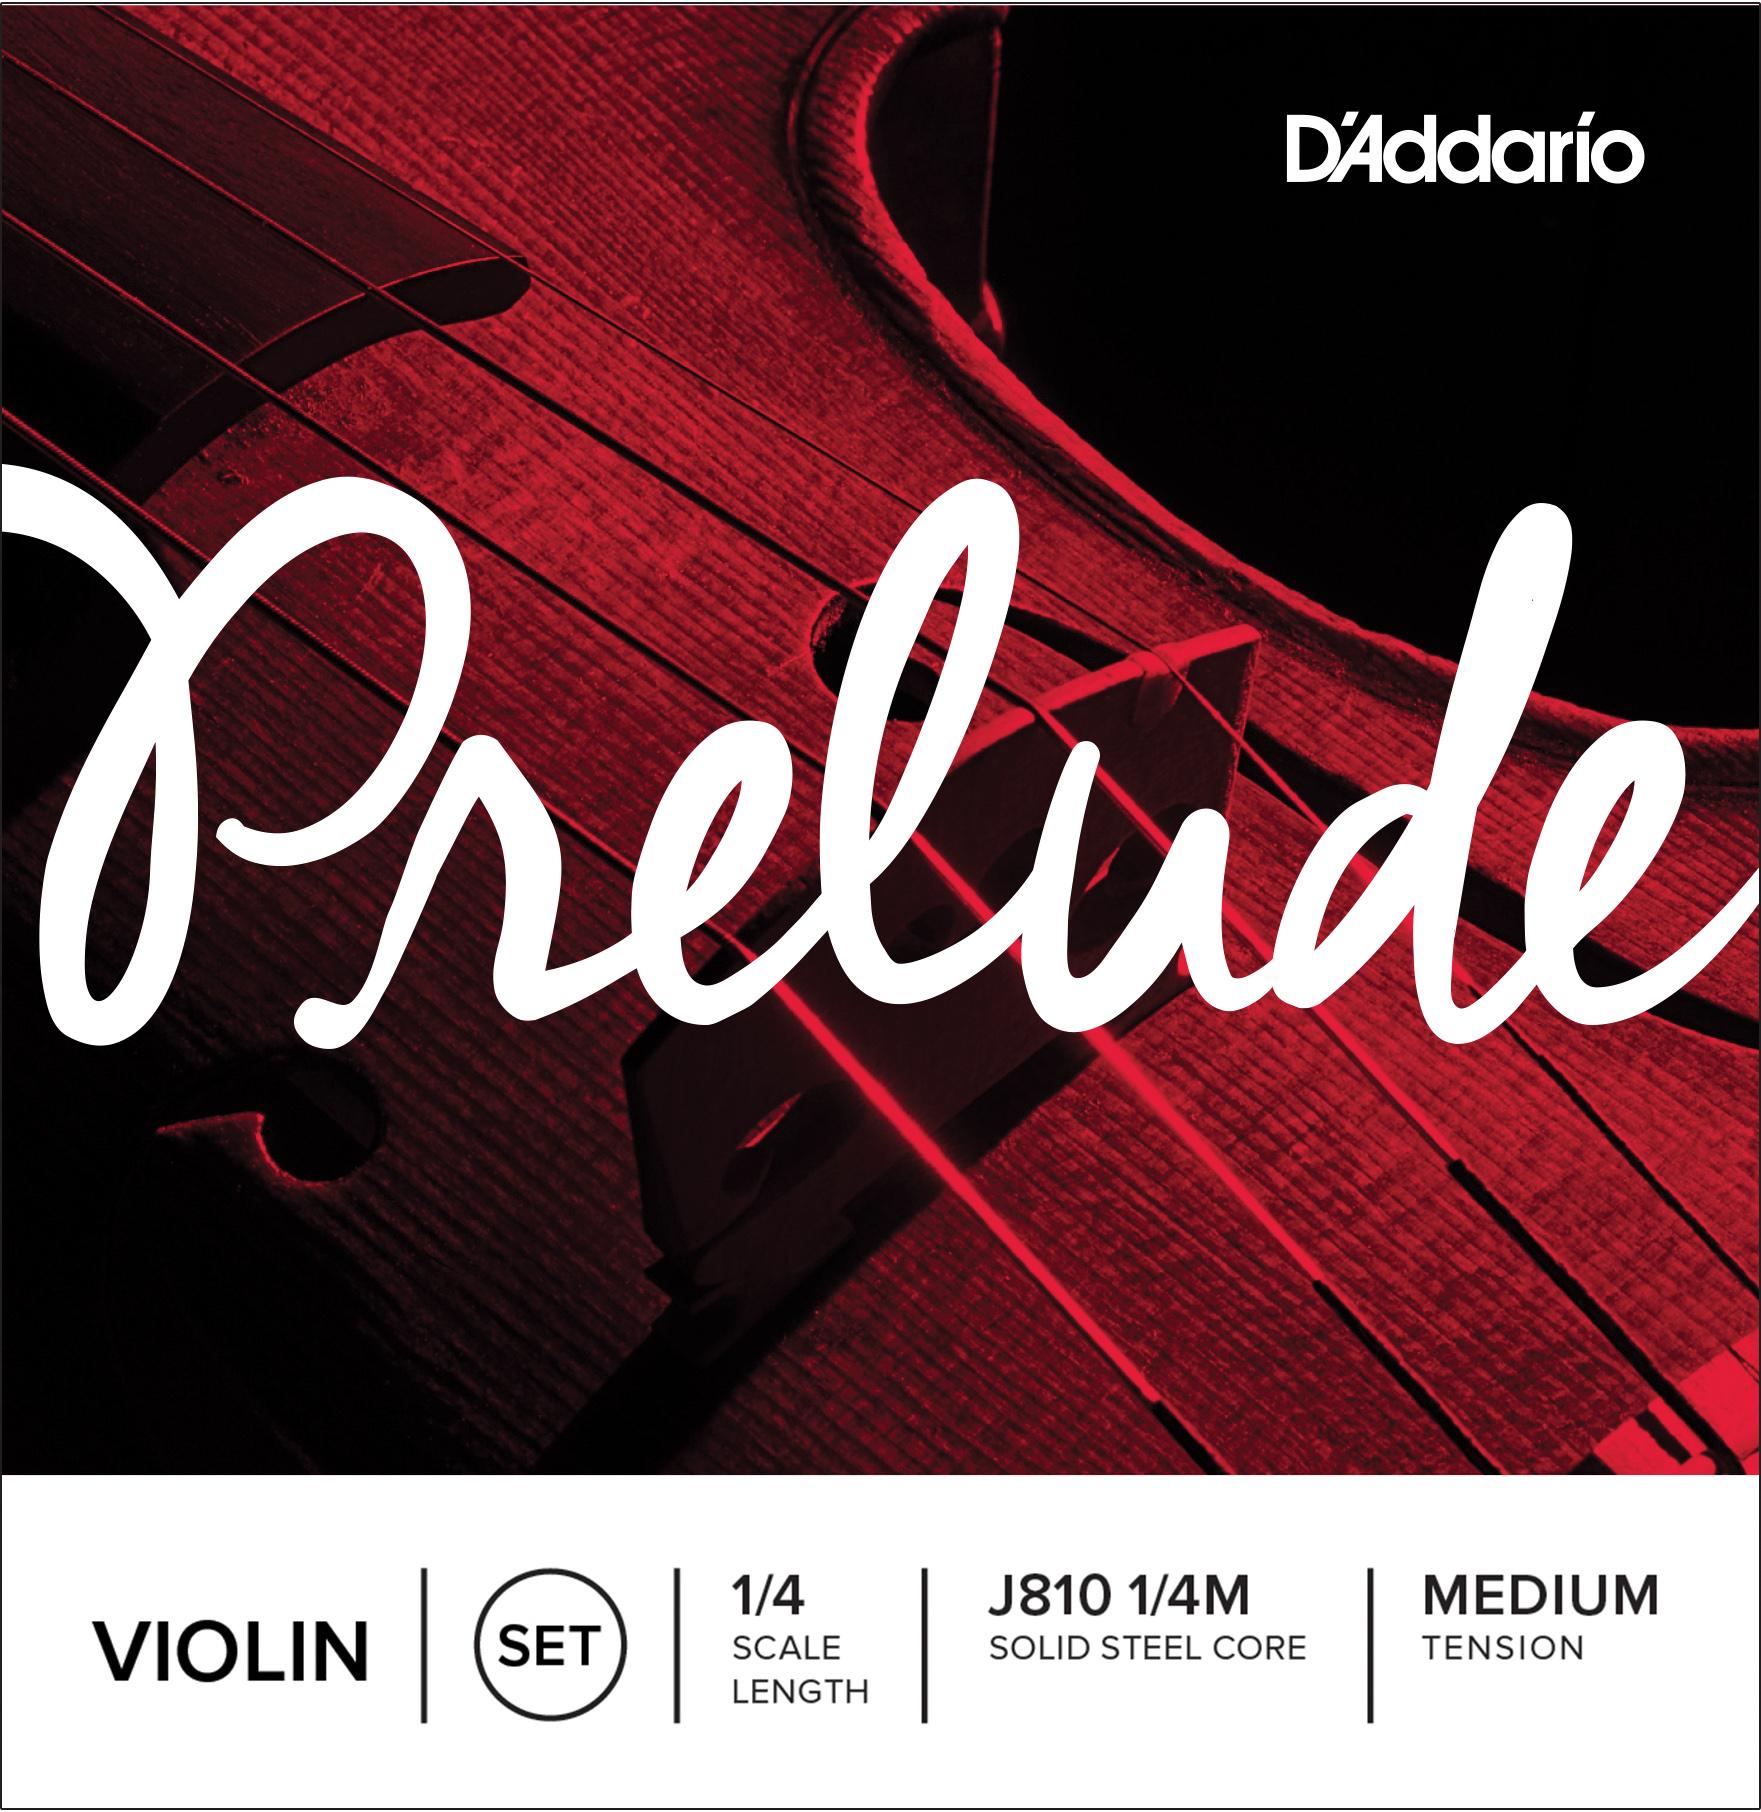 DADD Prelude Violin Set 1/4 MED